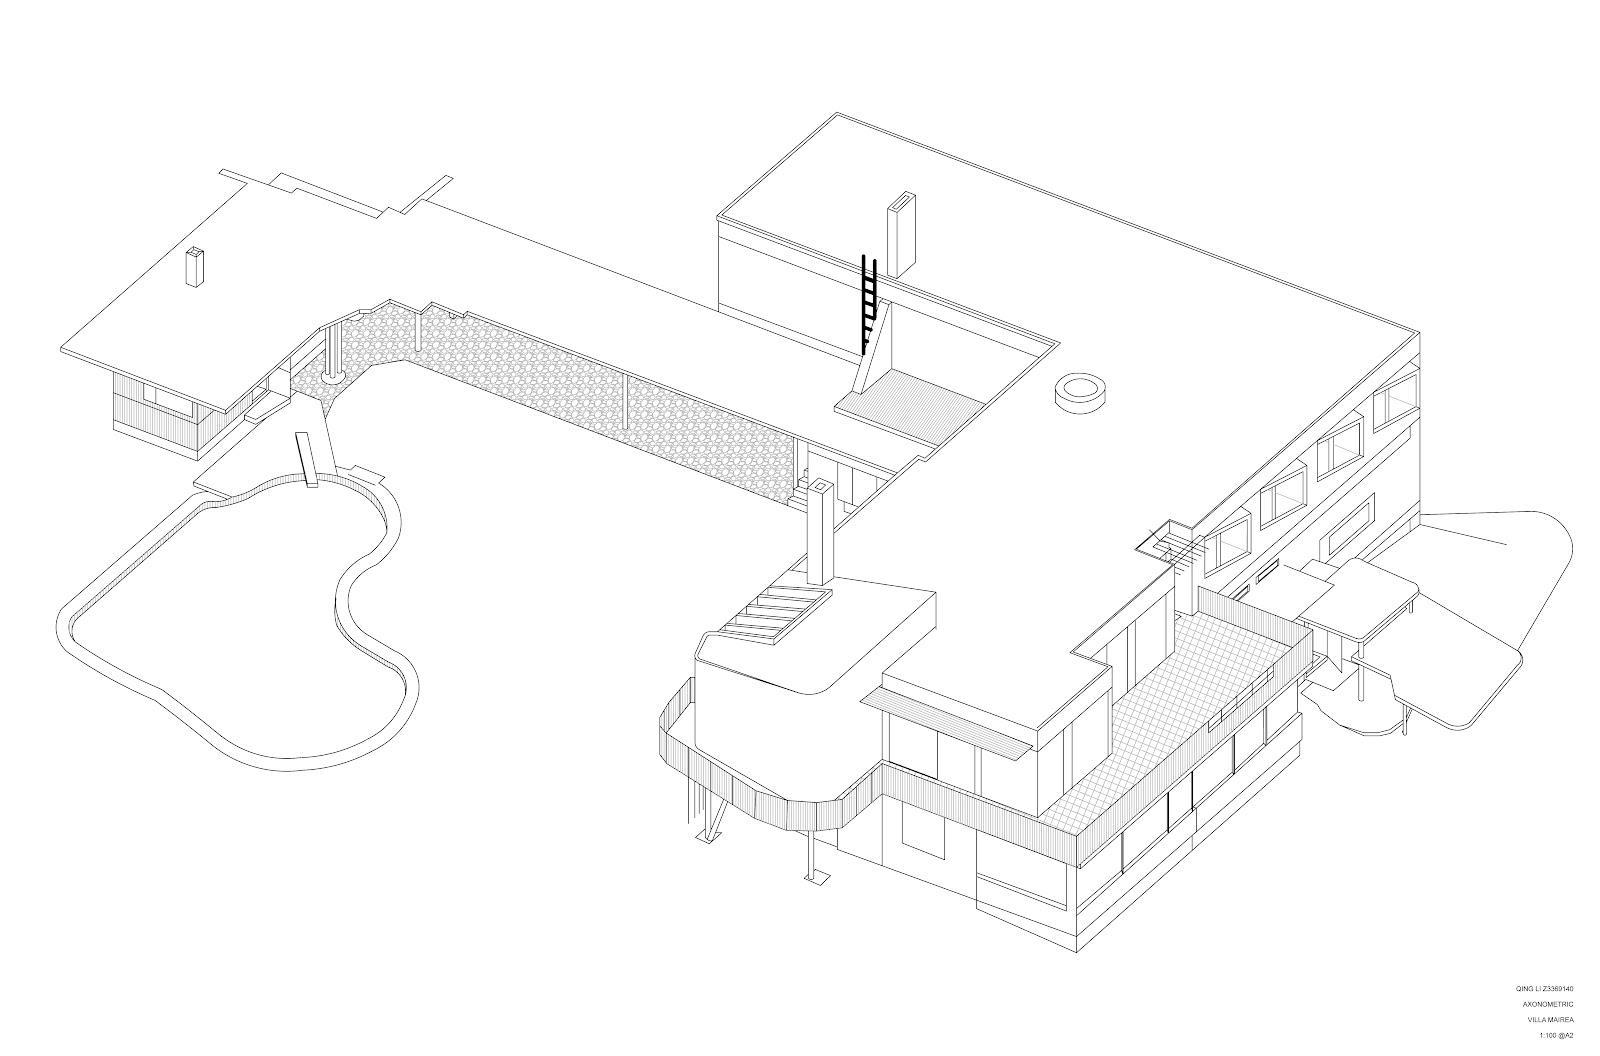 qing li  jenny  arch1202  villa mairea drawings